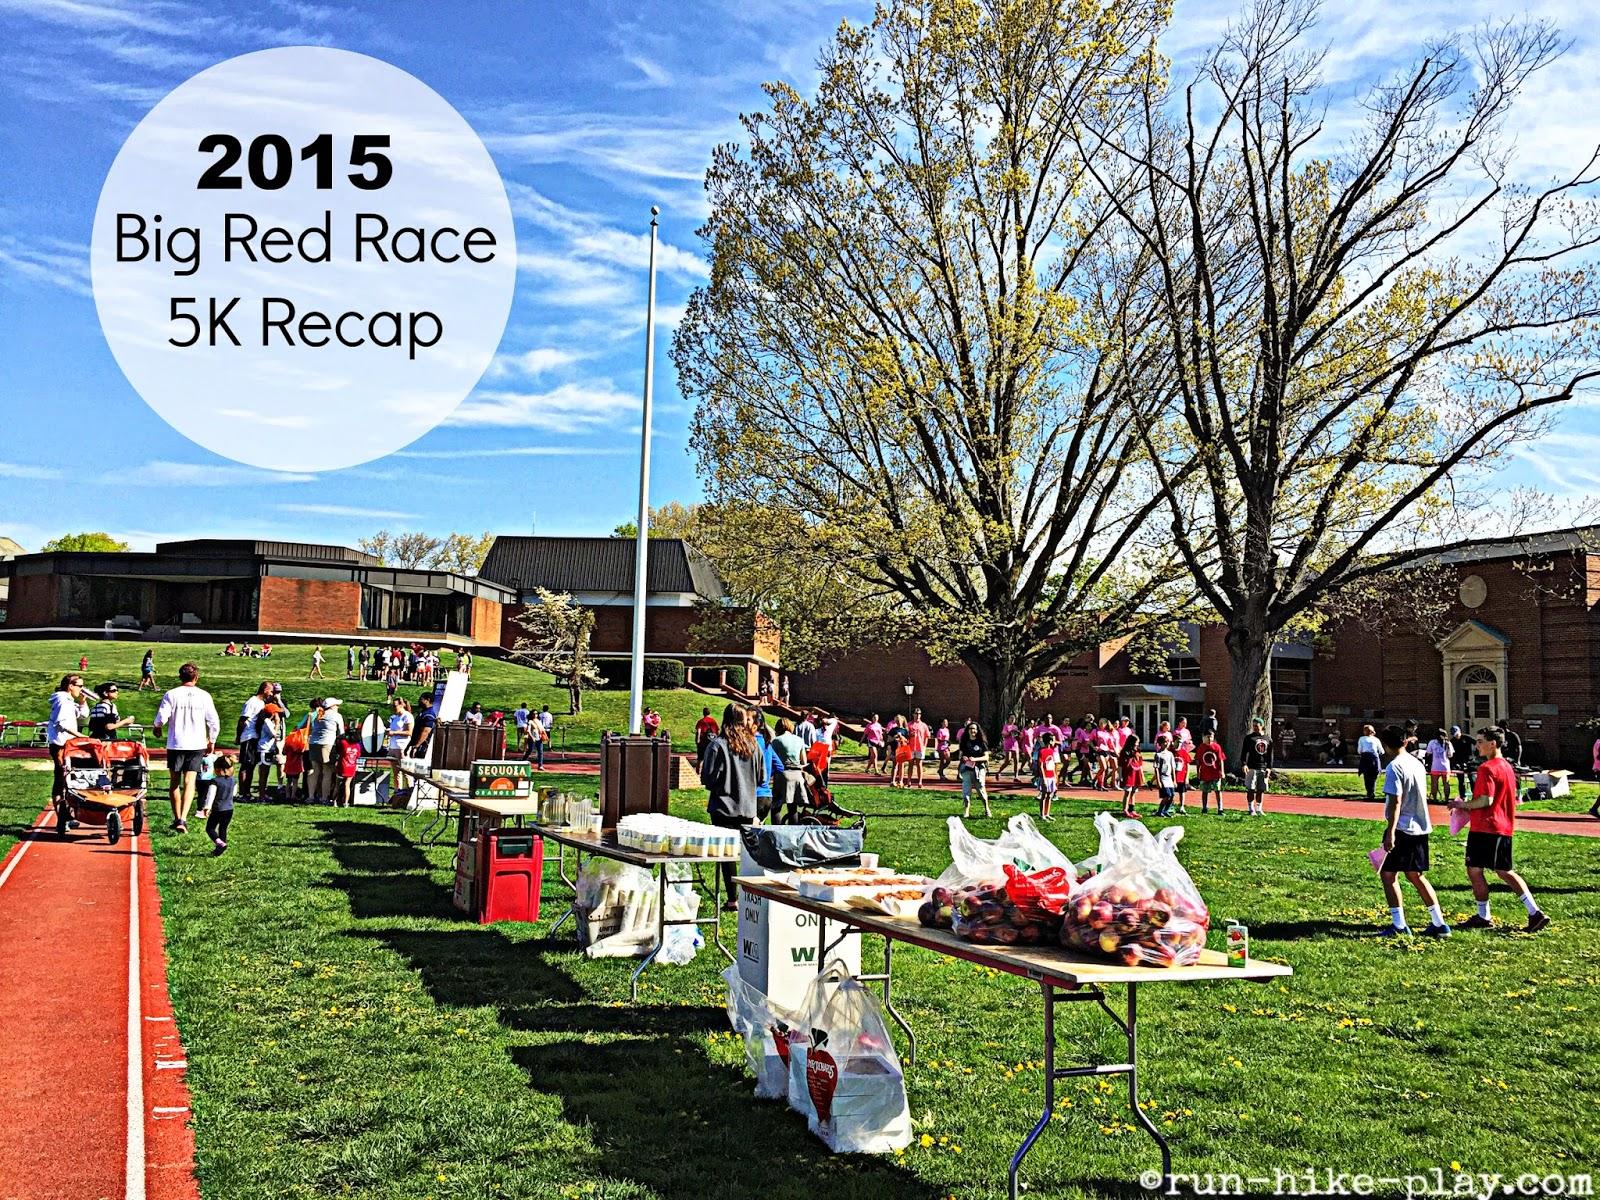 Run hike play 2015 big red race 5k race recap for Big red racing